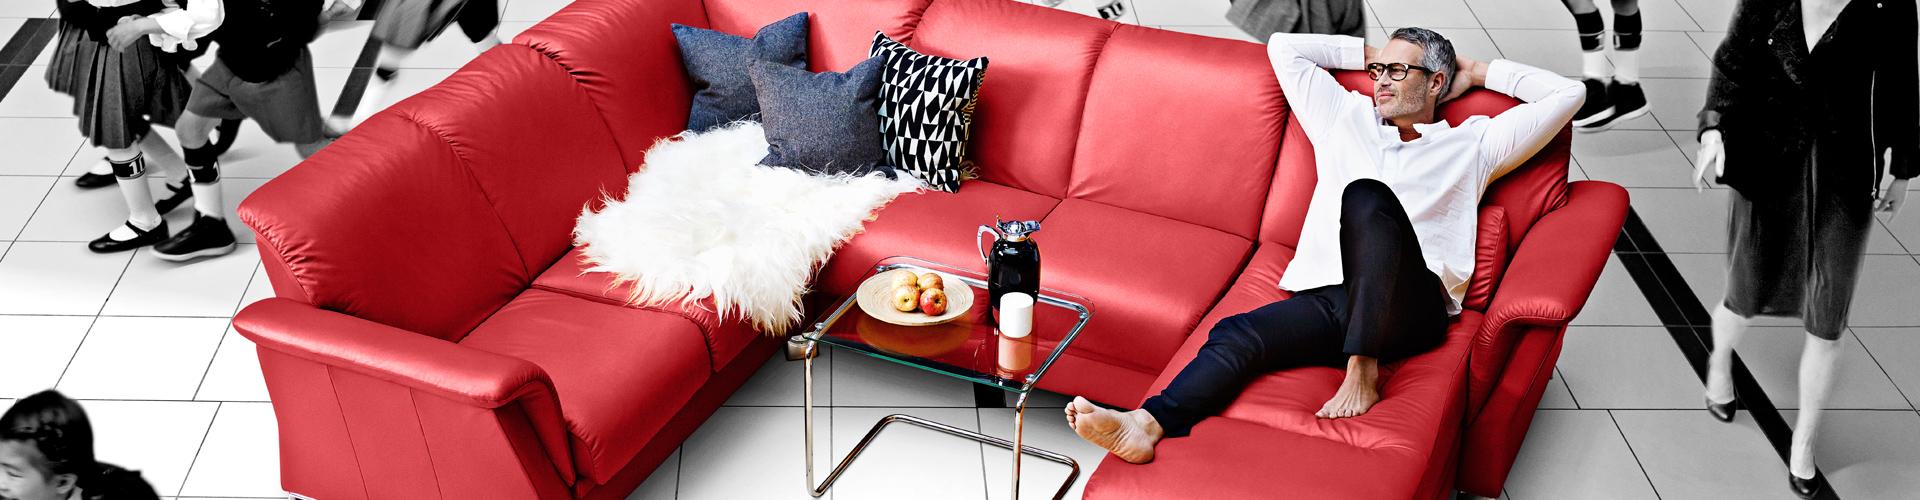 stressless-sofa-2015-005